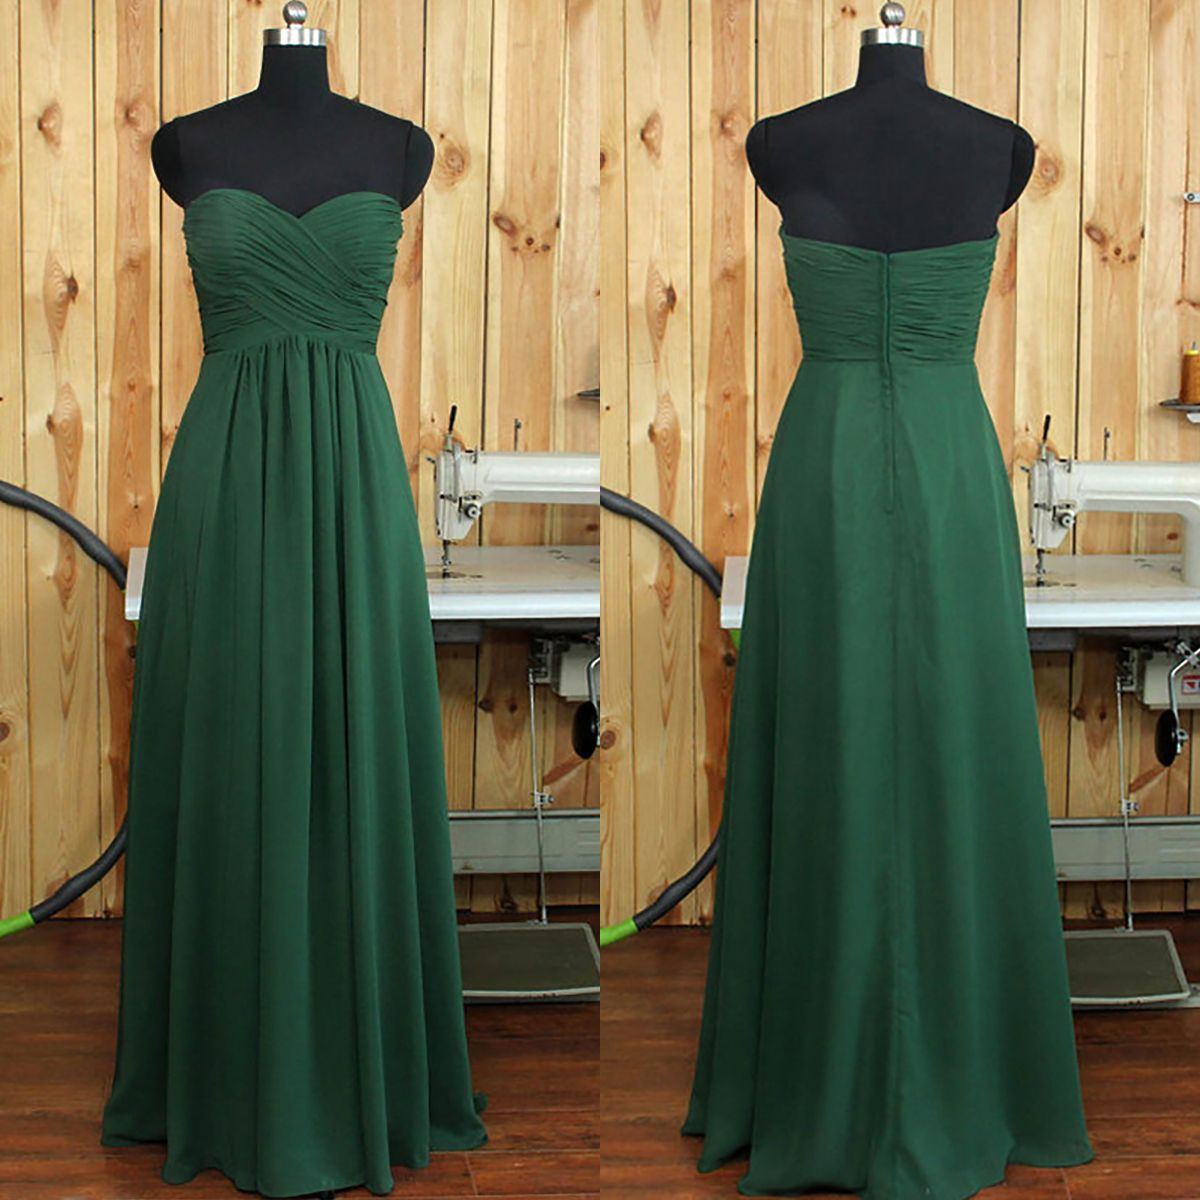 Dark Green Bridesmaid Dress Online, A-line Sweetheart Bridesmaid